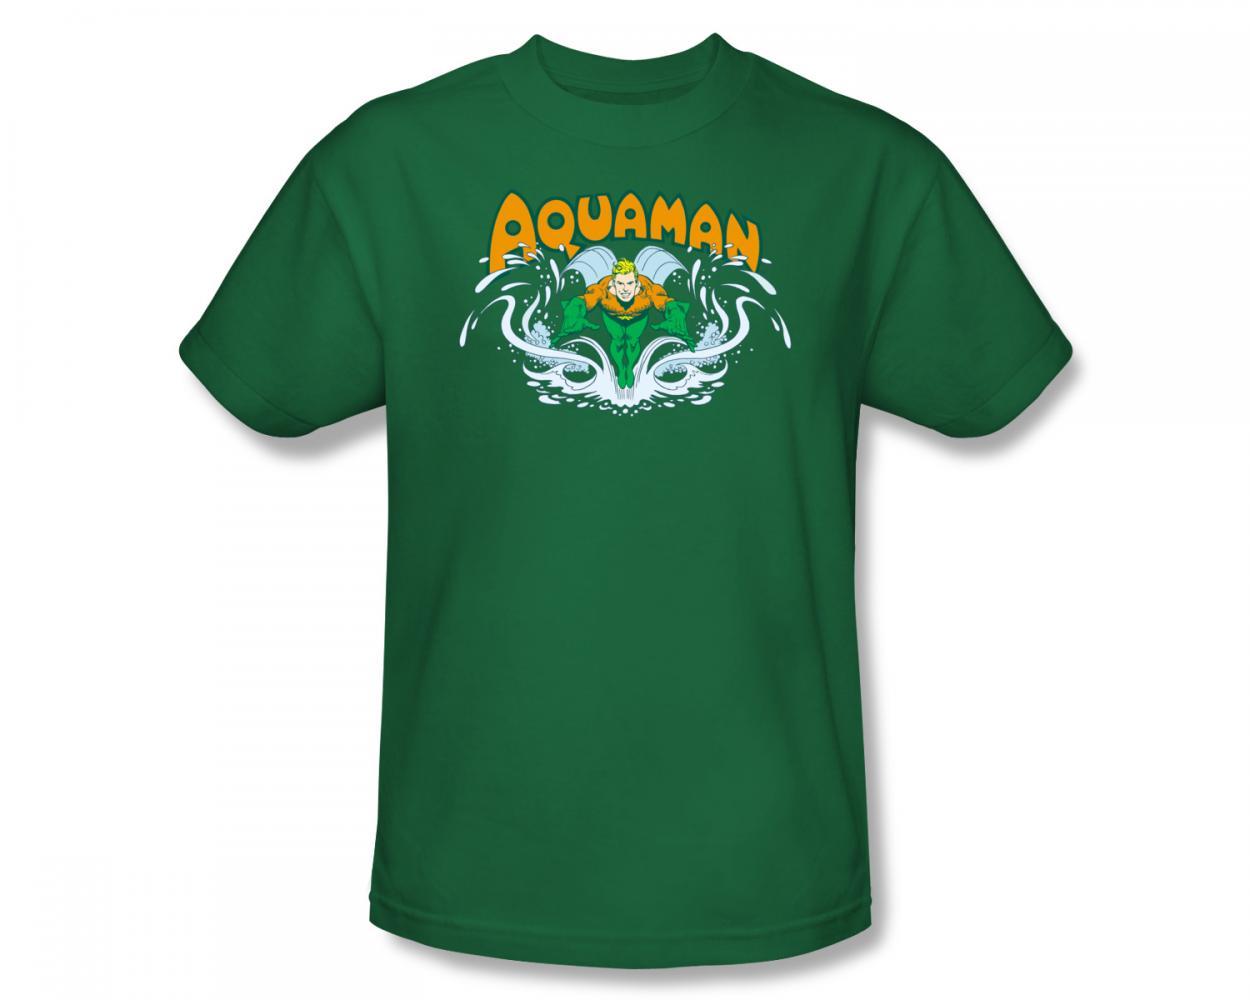 Image of Aquaman - Aquaman Splash Slim Fit Adult T-Shirt In Kelly Green